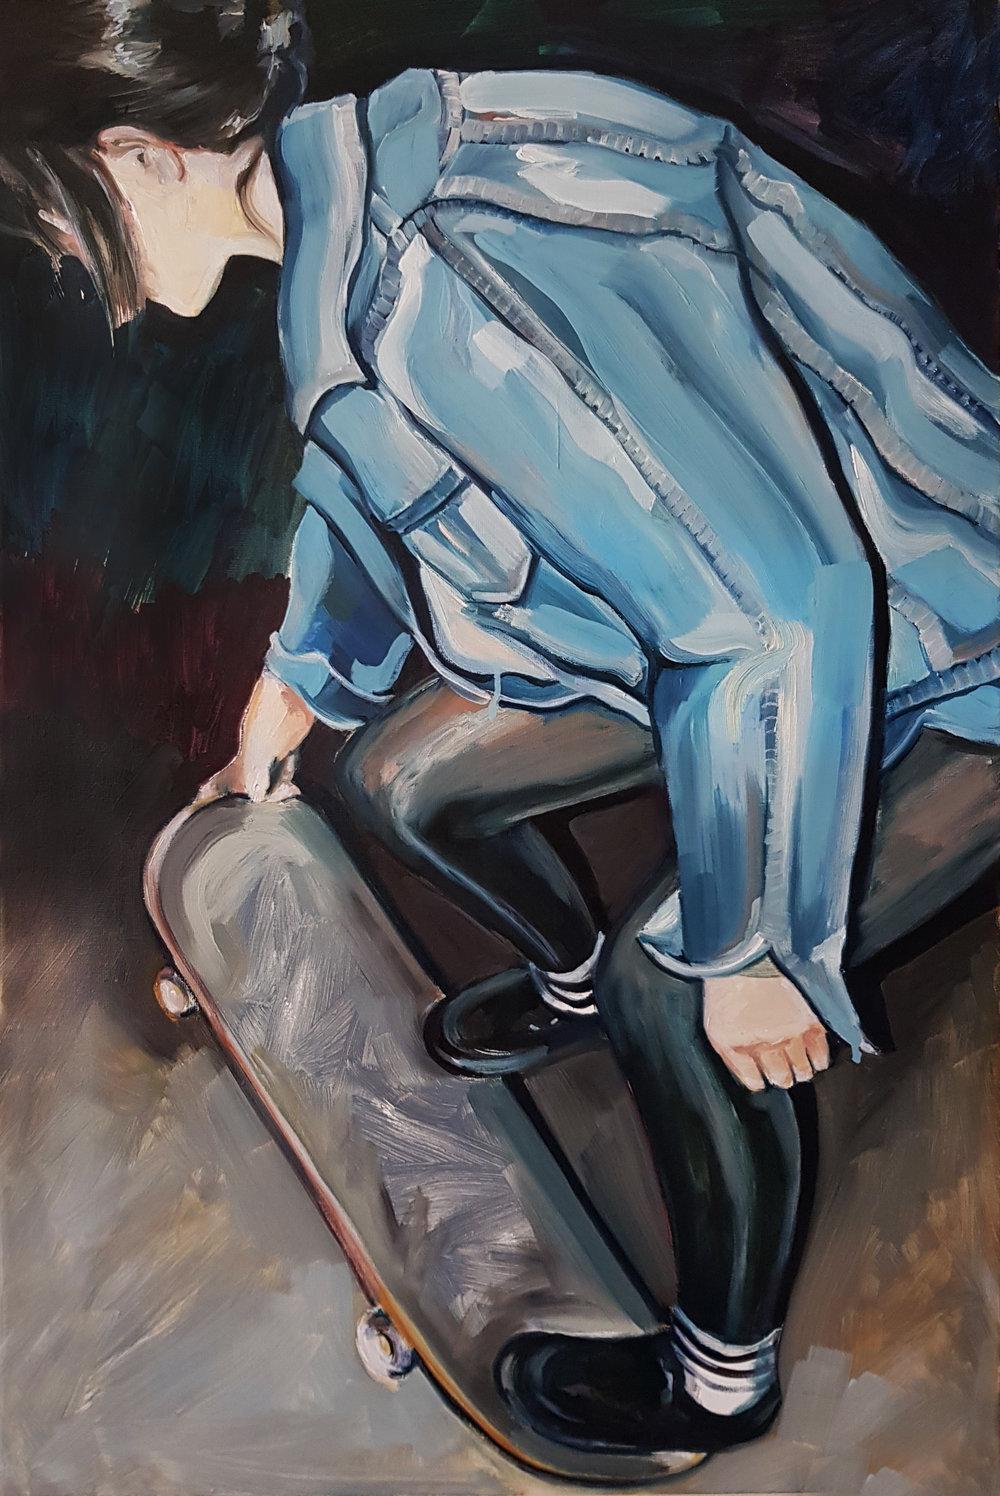 AmaiaMarzabal - WhatDoesItMeanToBeAWoman - oil -24x36- 2018 - $3,500.jpg